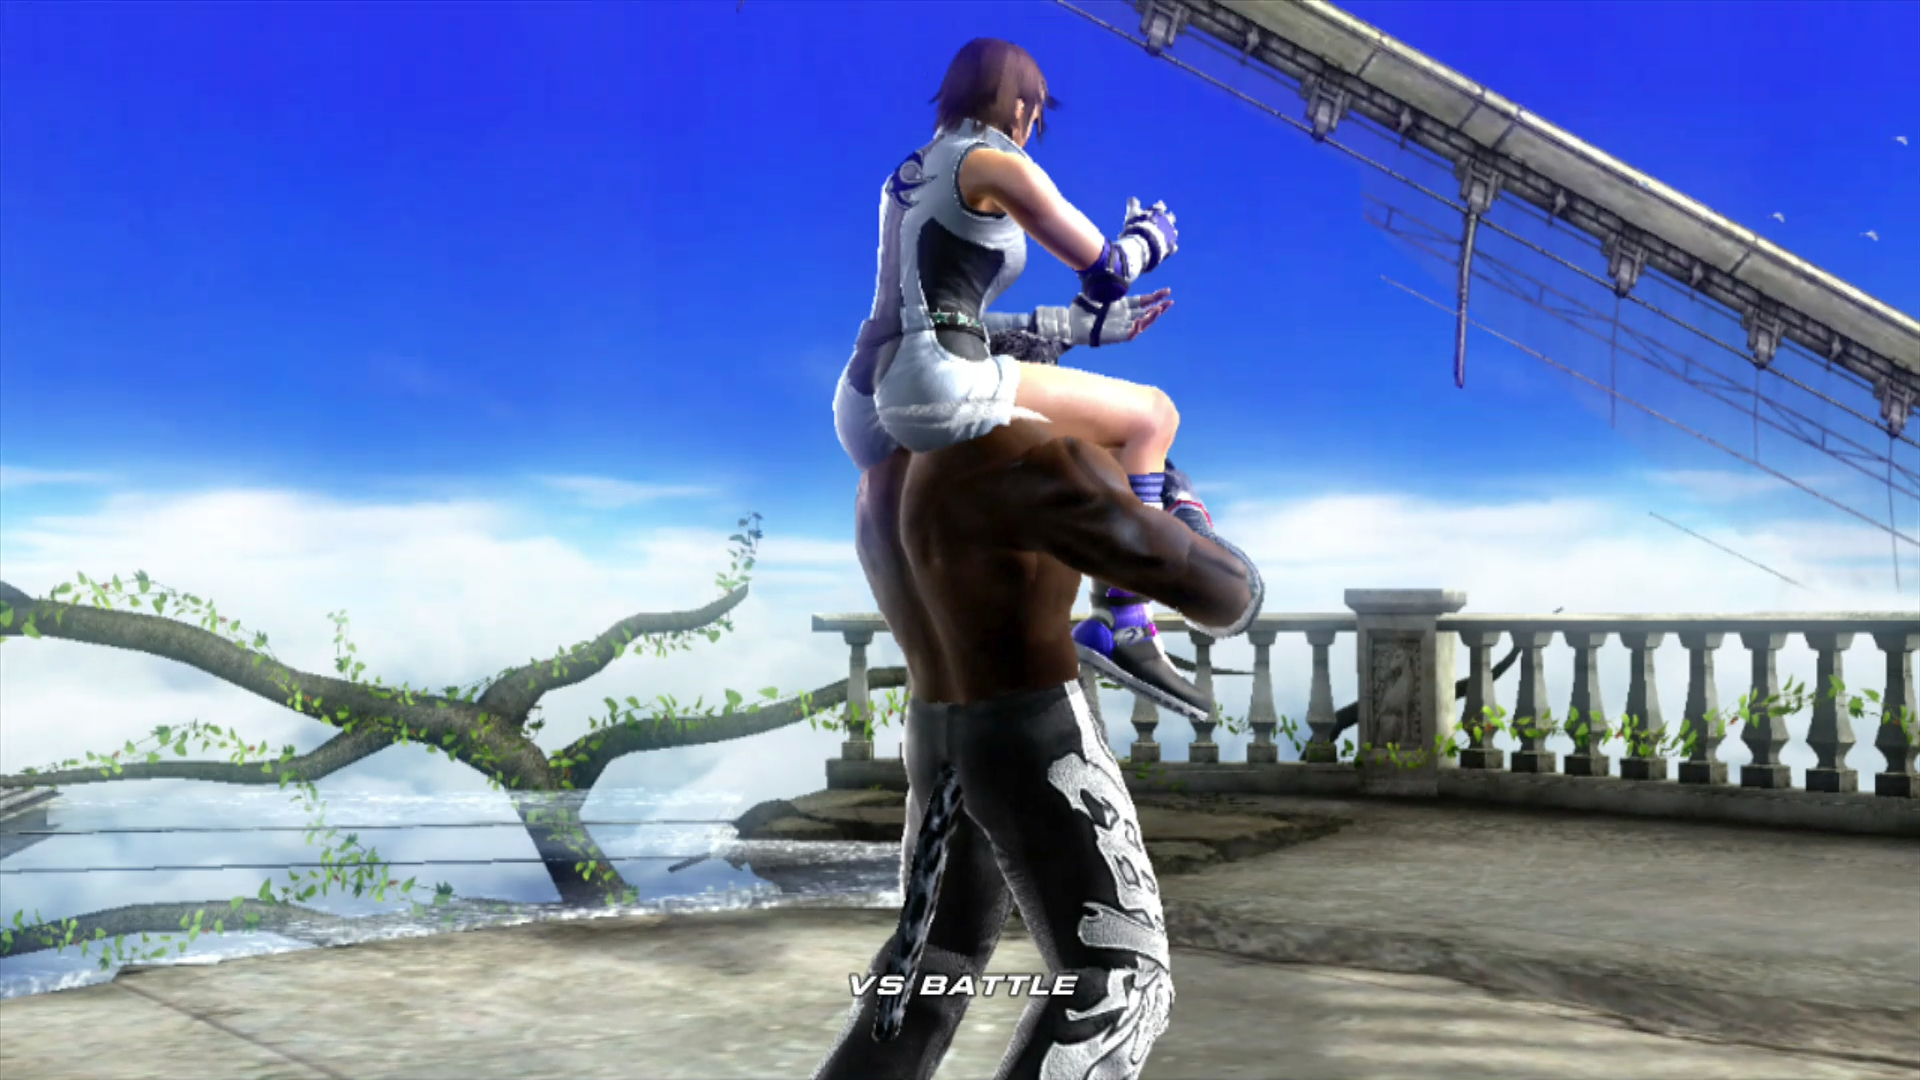 Tekken 6 Asuka Kazama and Armor King  by AllTheStawf on